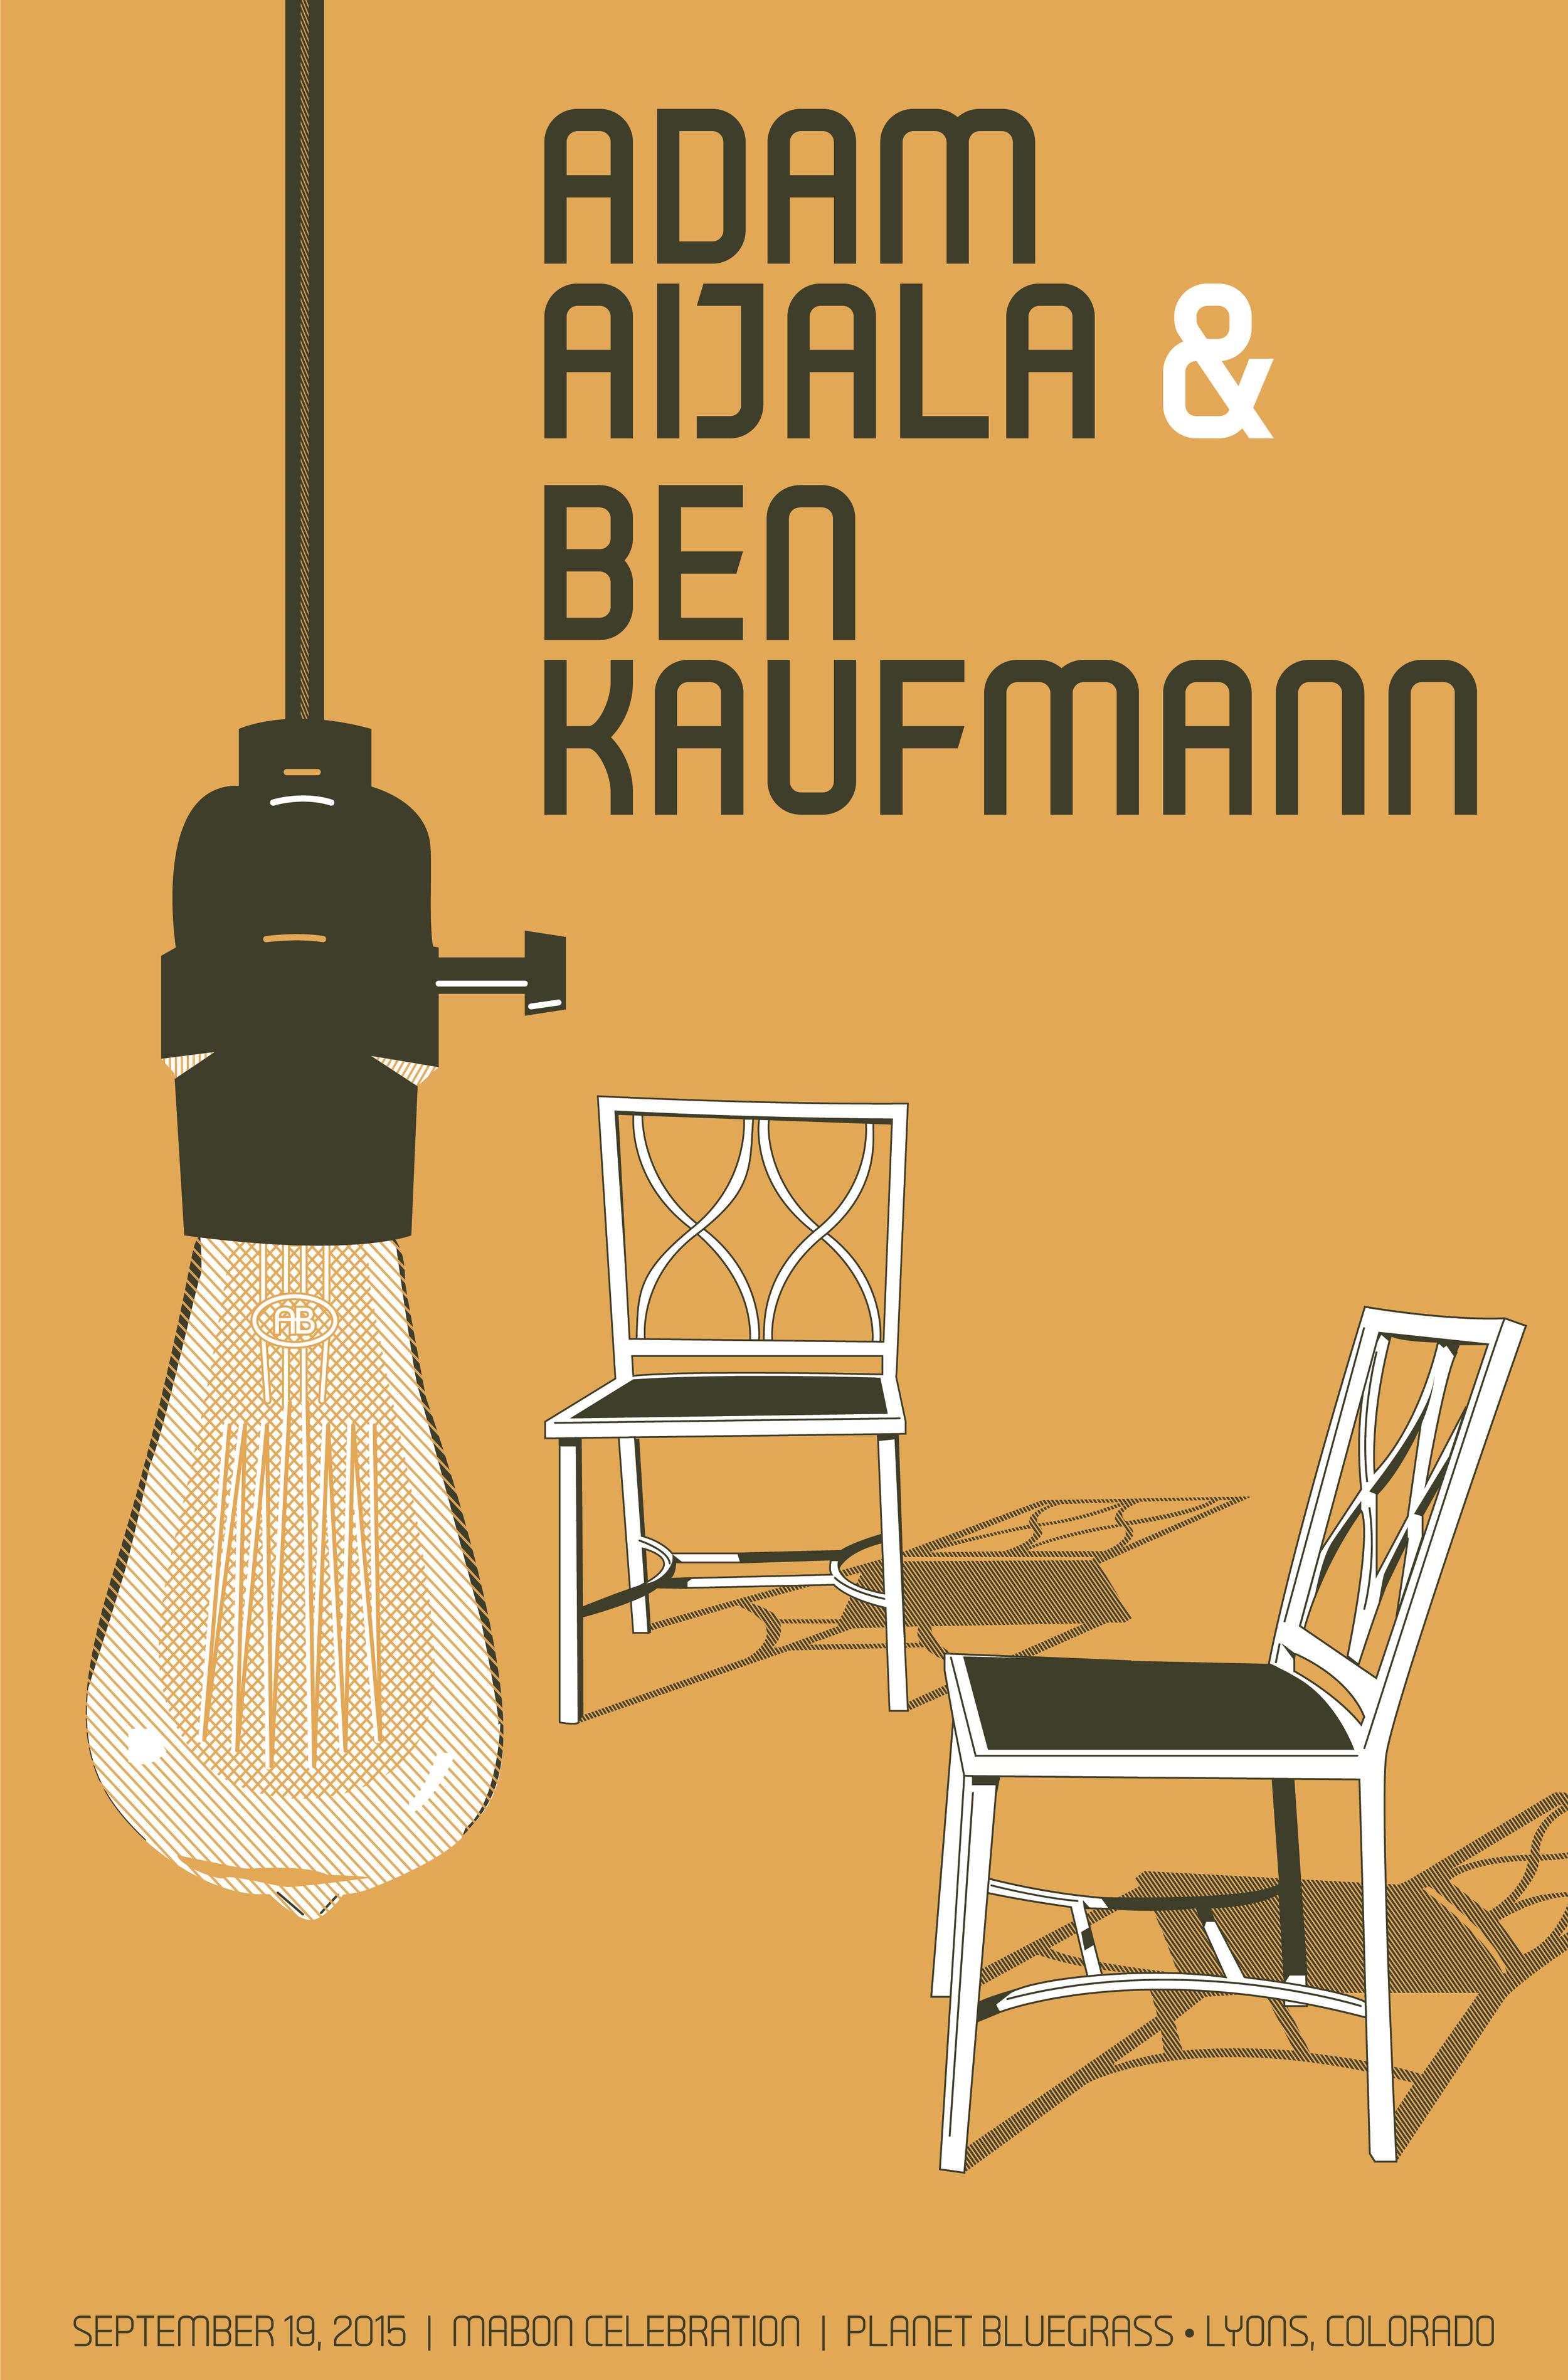 Chairs - Adam Aijala & Ben Kaufmann (Mabon)